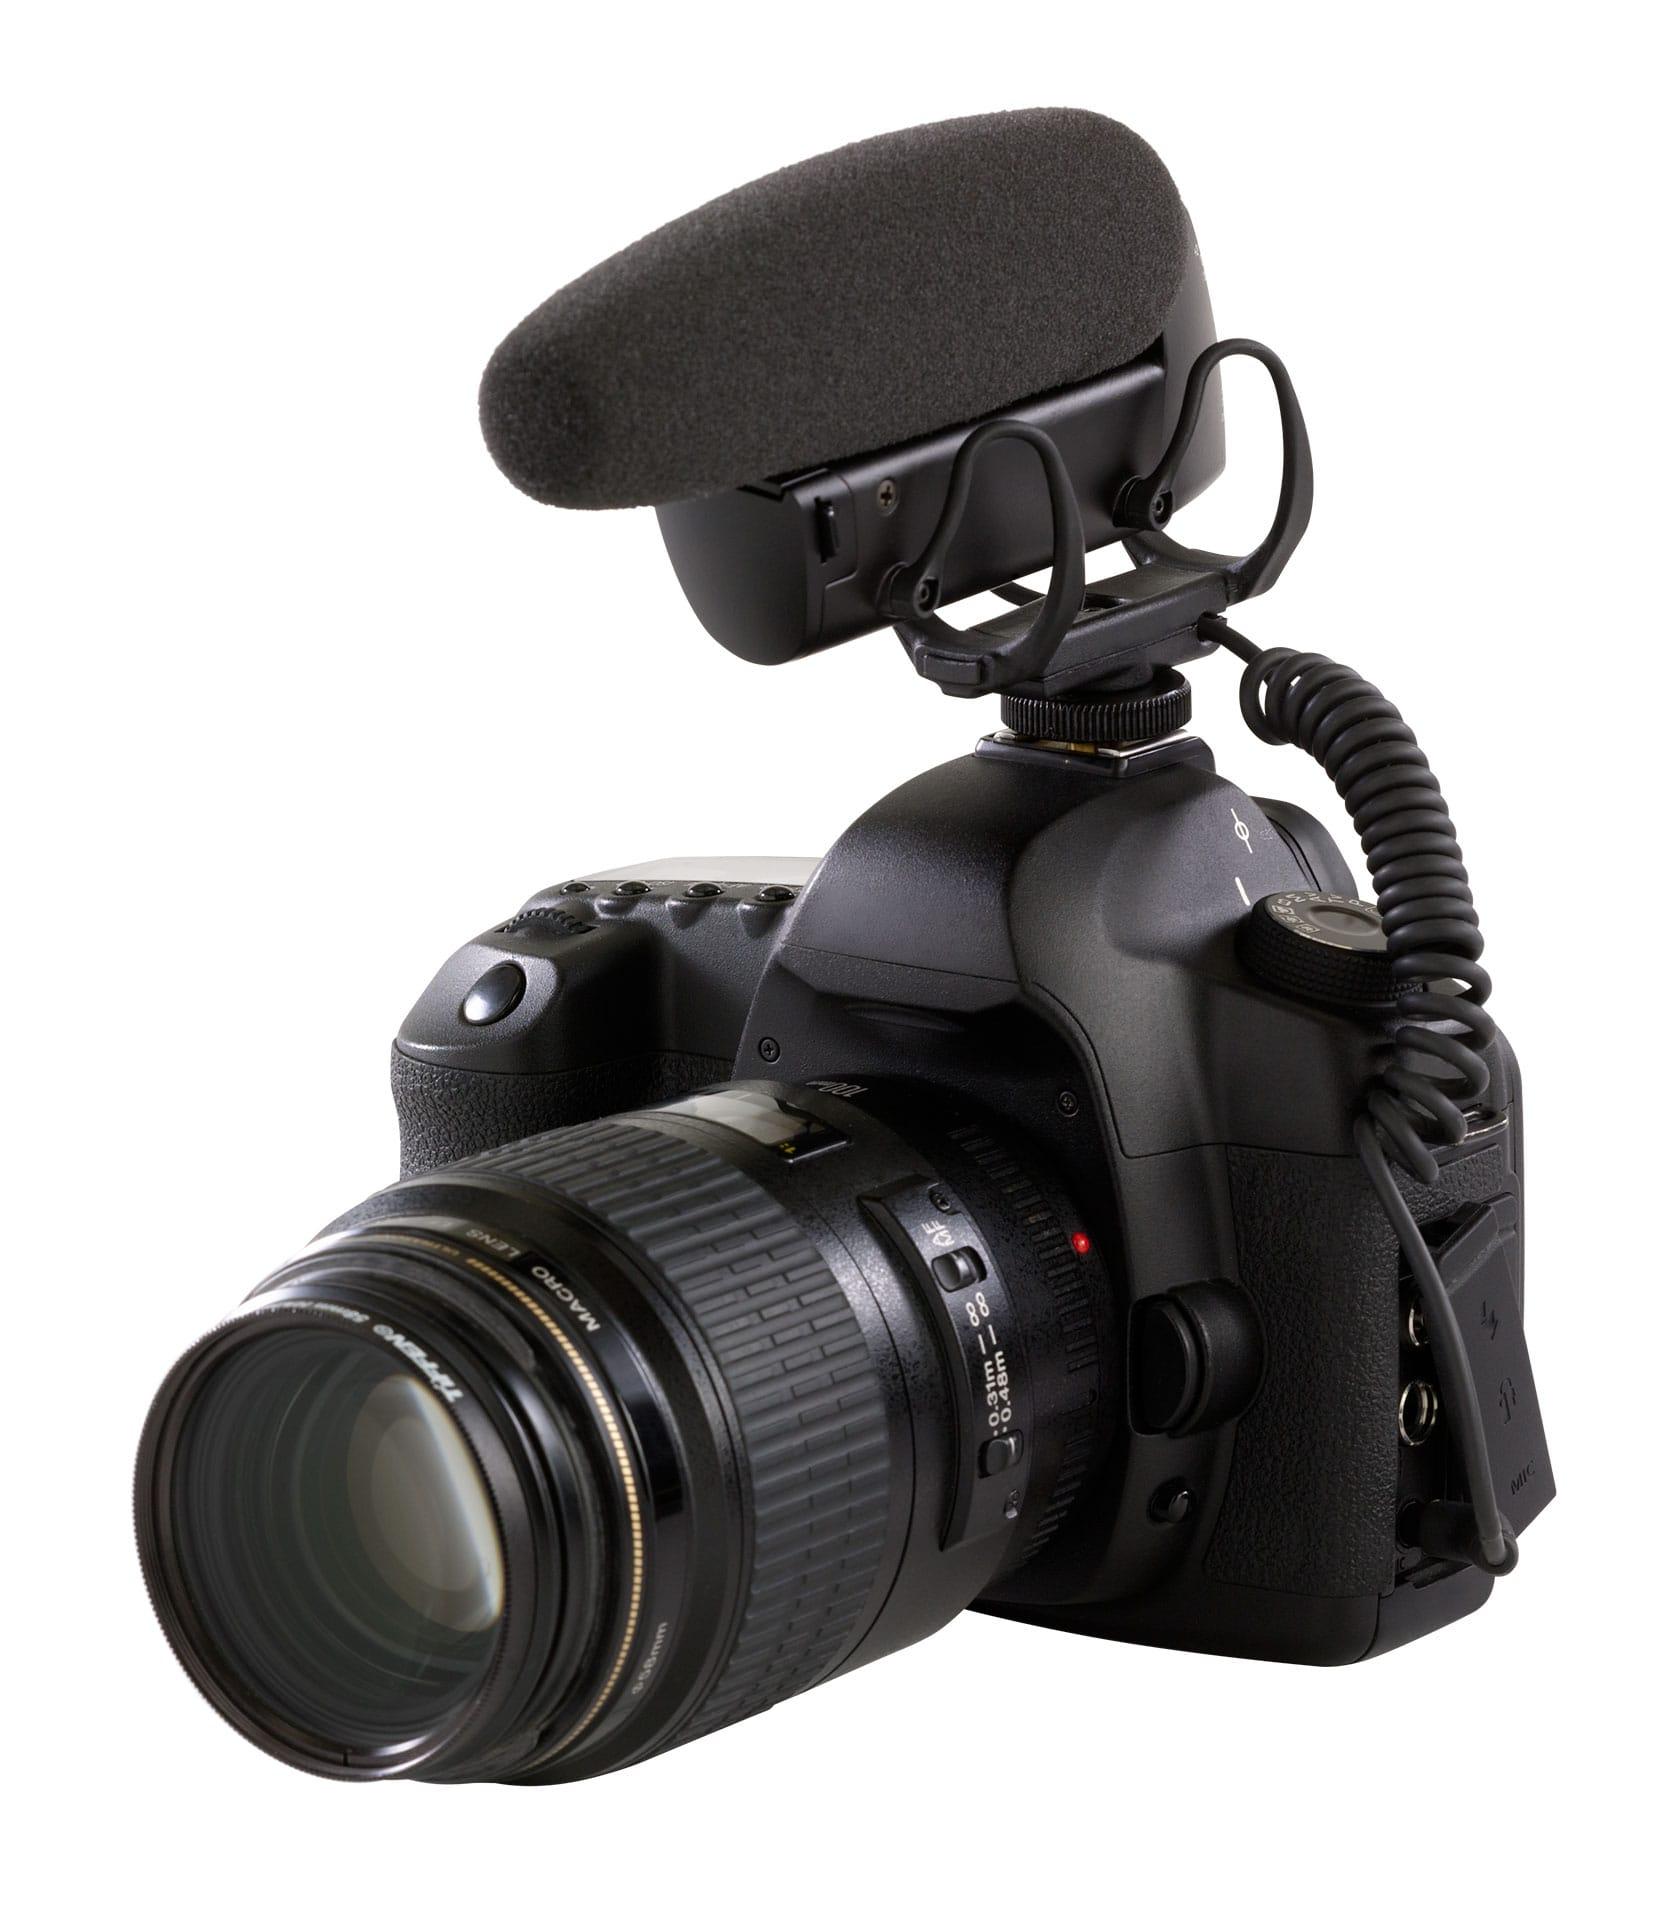 VP83 Camera Shotgun Microphone - Buy Online